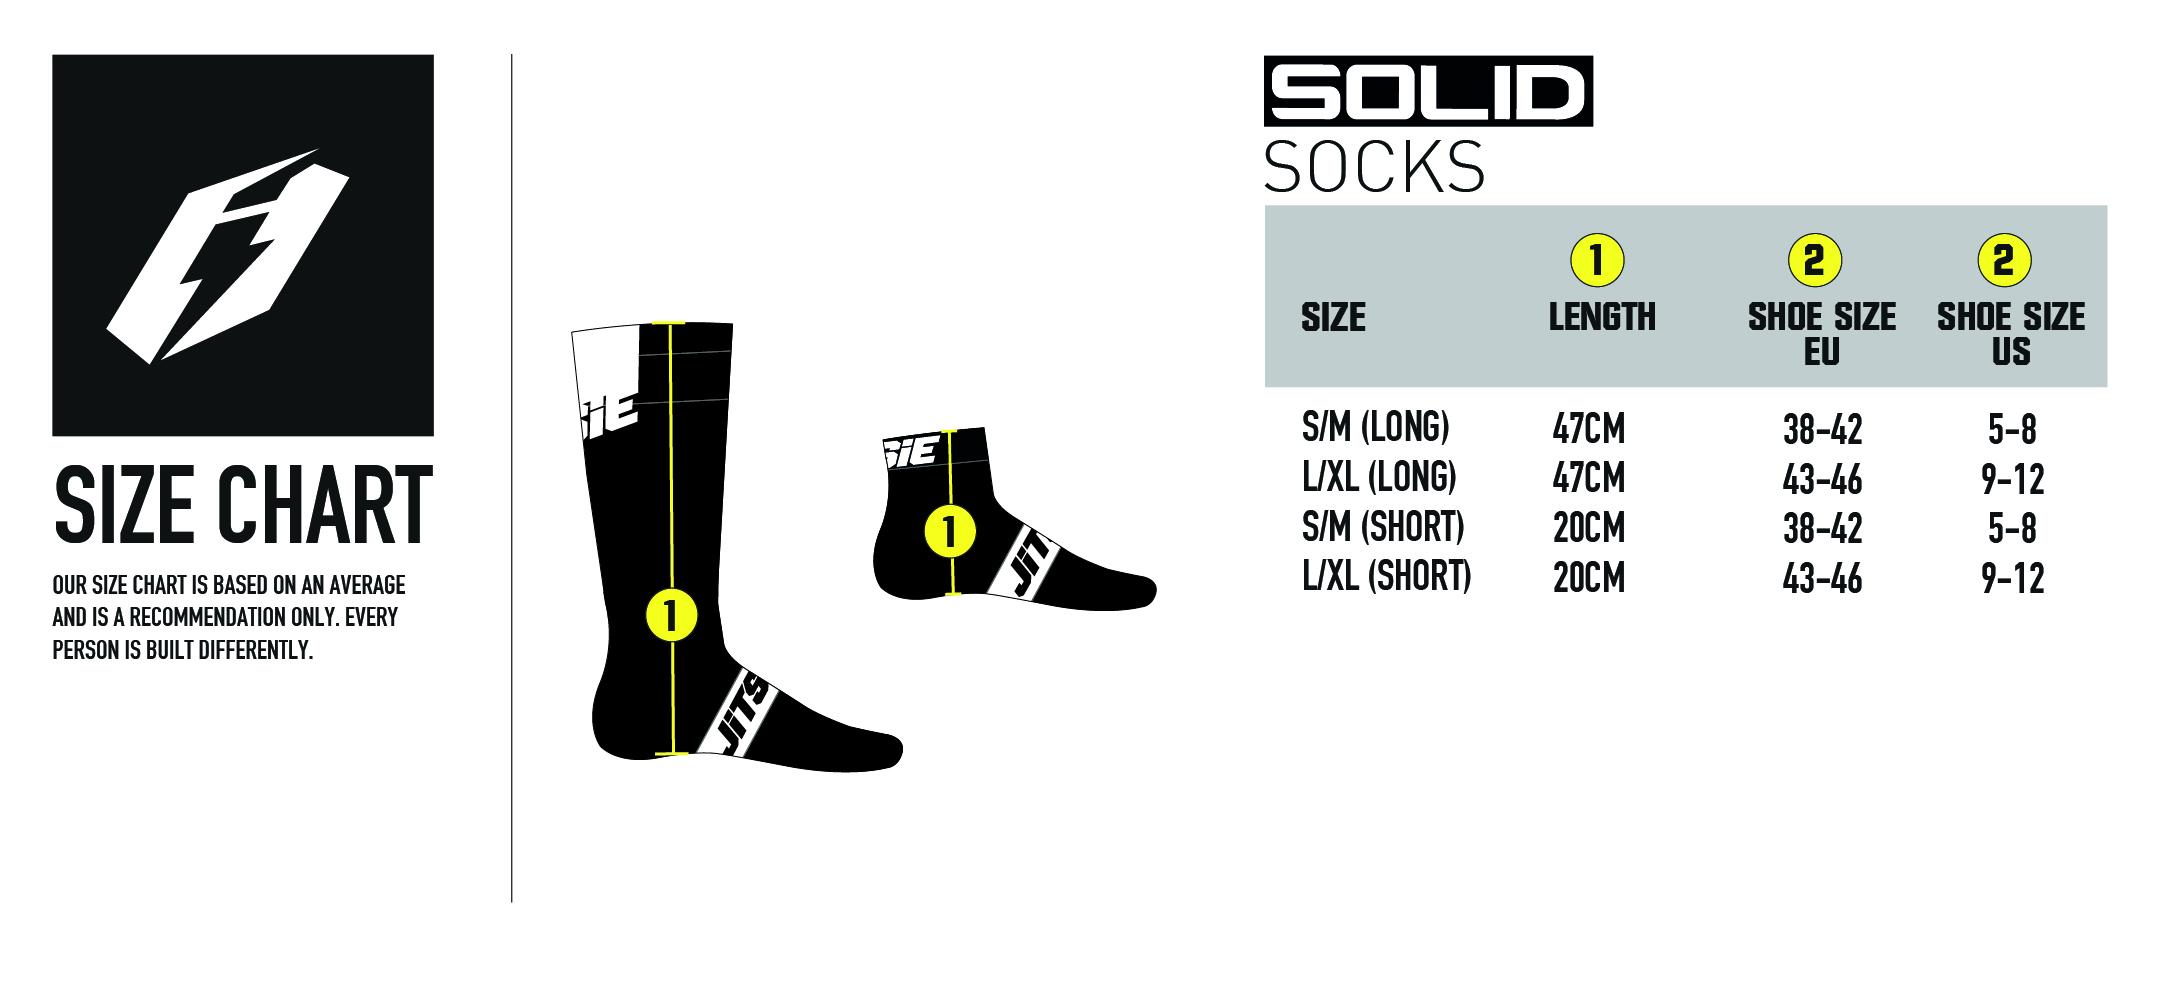 Sizechart_Solid_socks.jpg